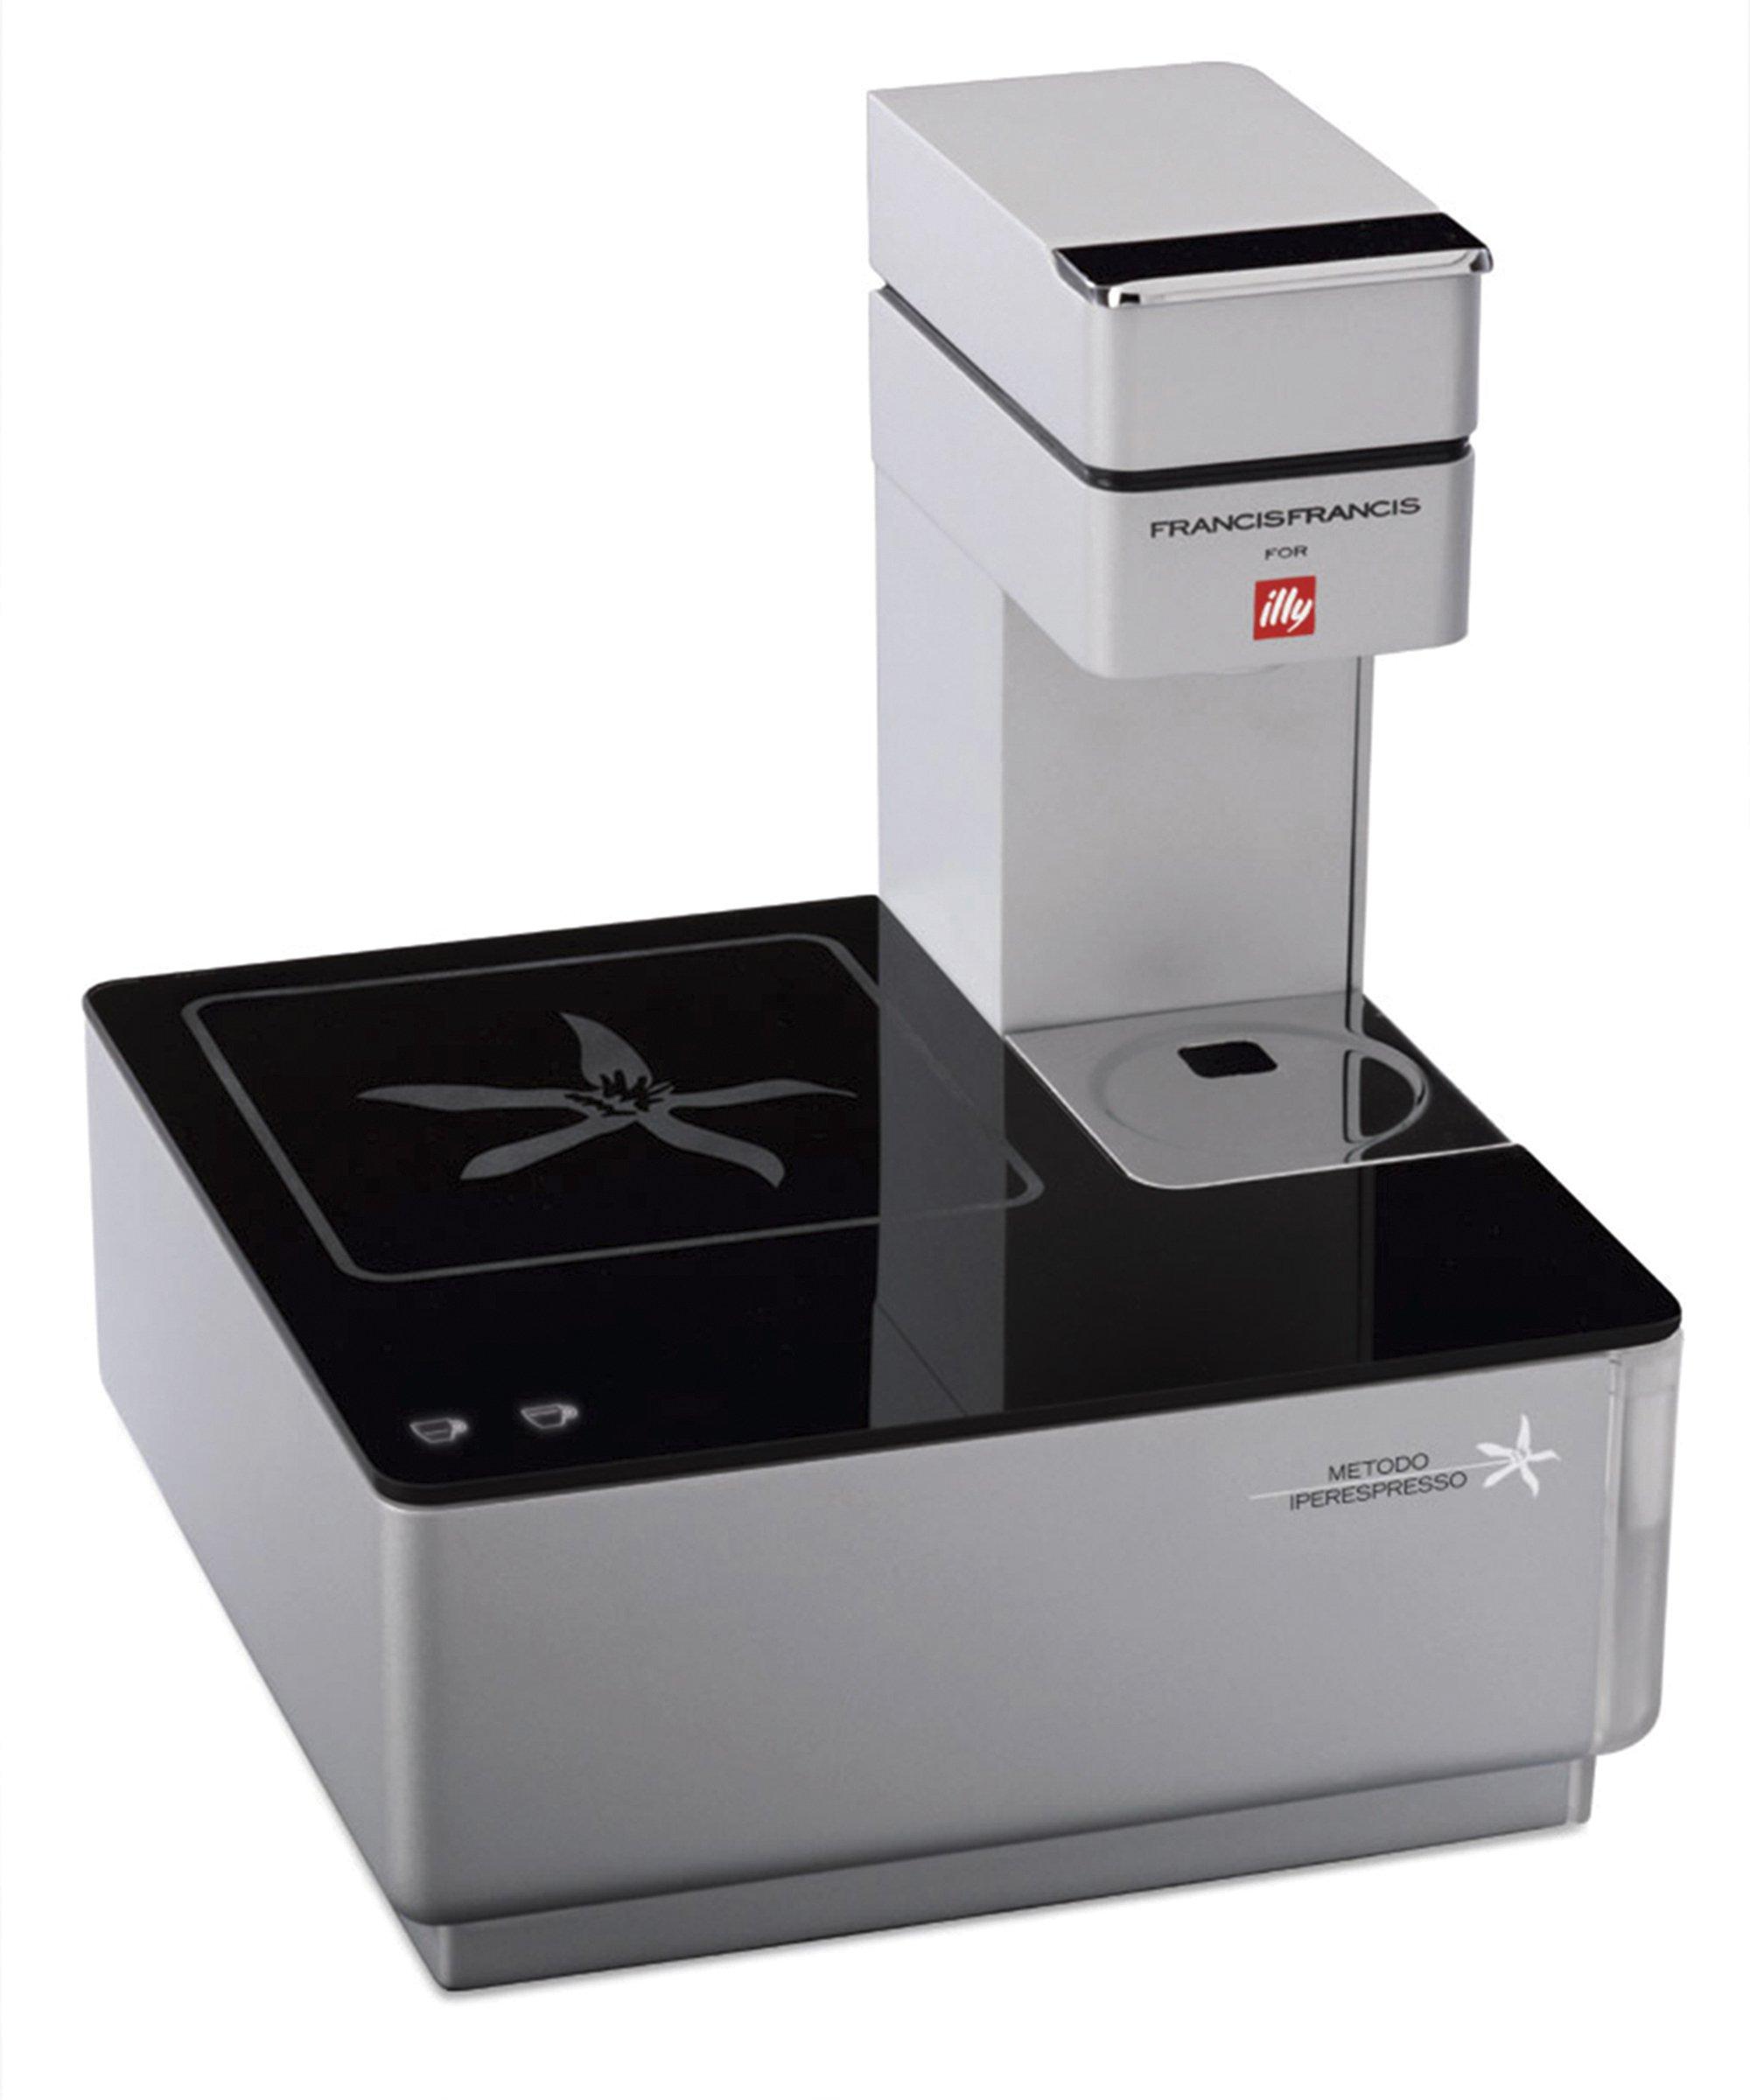 Illy Caffe Y1.1 216627 Touch Espresso Machine, Black by Illy